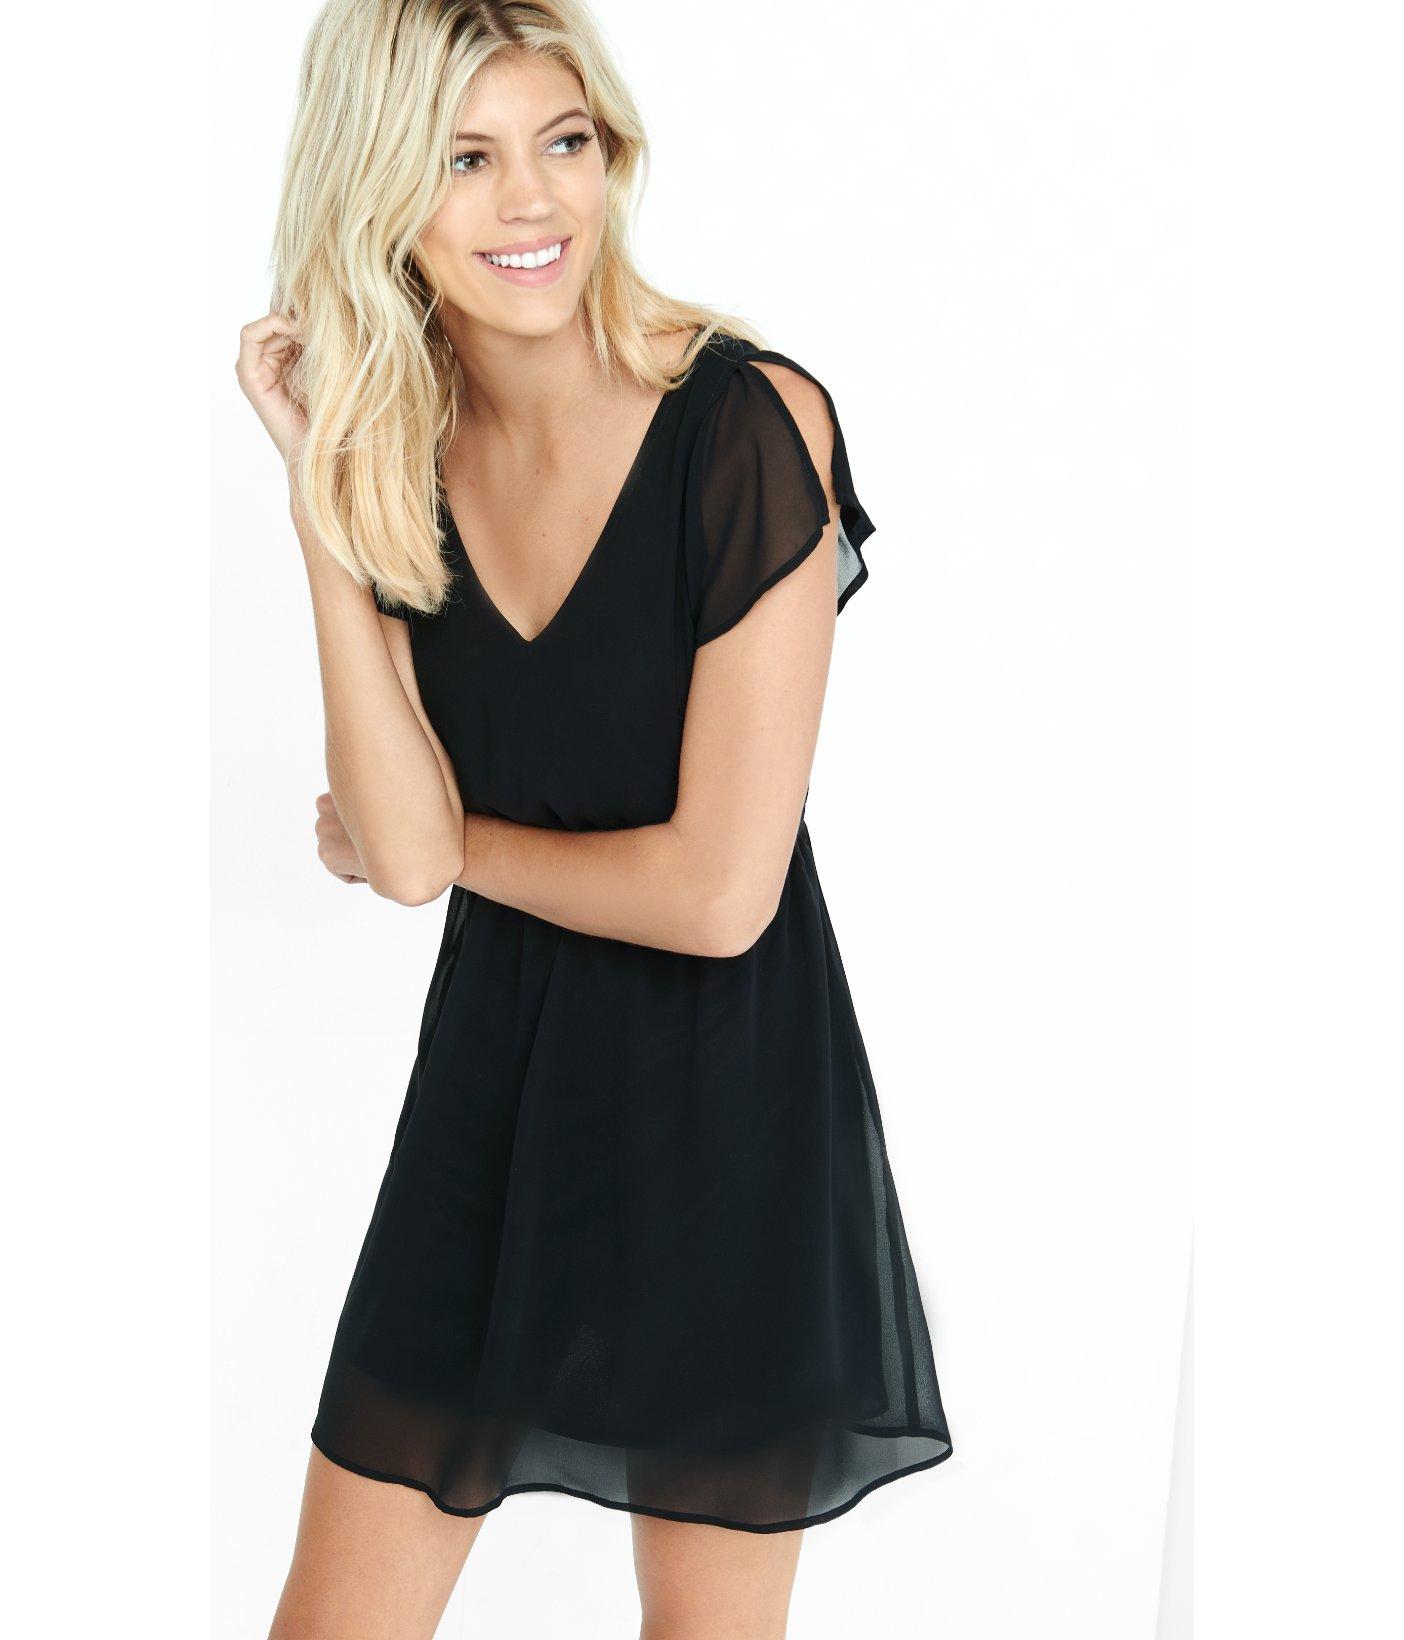 Express Black V-neck Cap Sleeve Chiffon Mini Dress in Black | Lyst